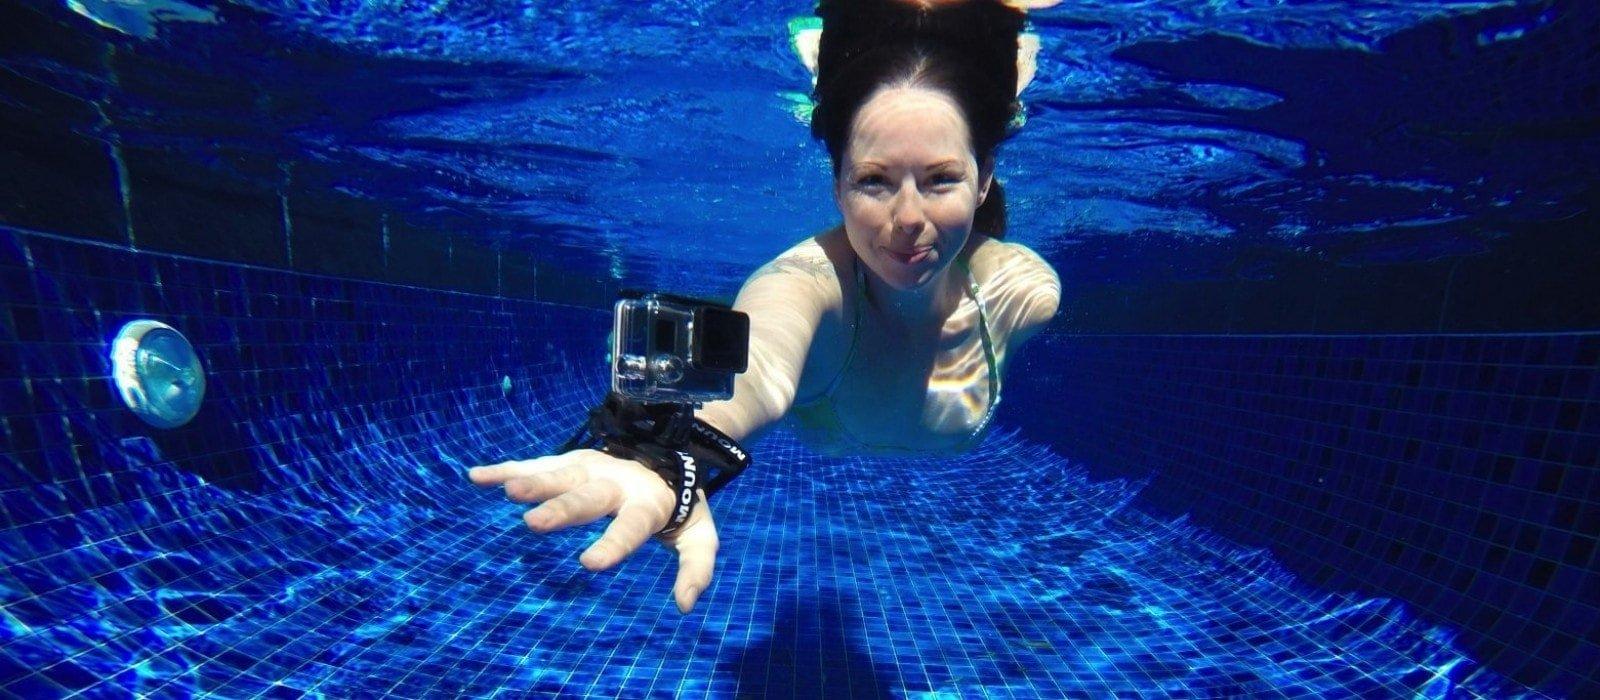 Kelly-Ella-Maz_GoPro-Accessories-2-1600x700_1